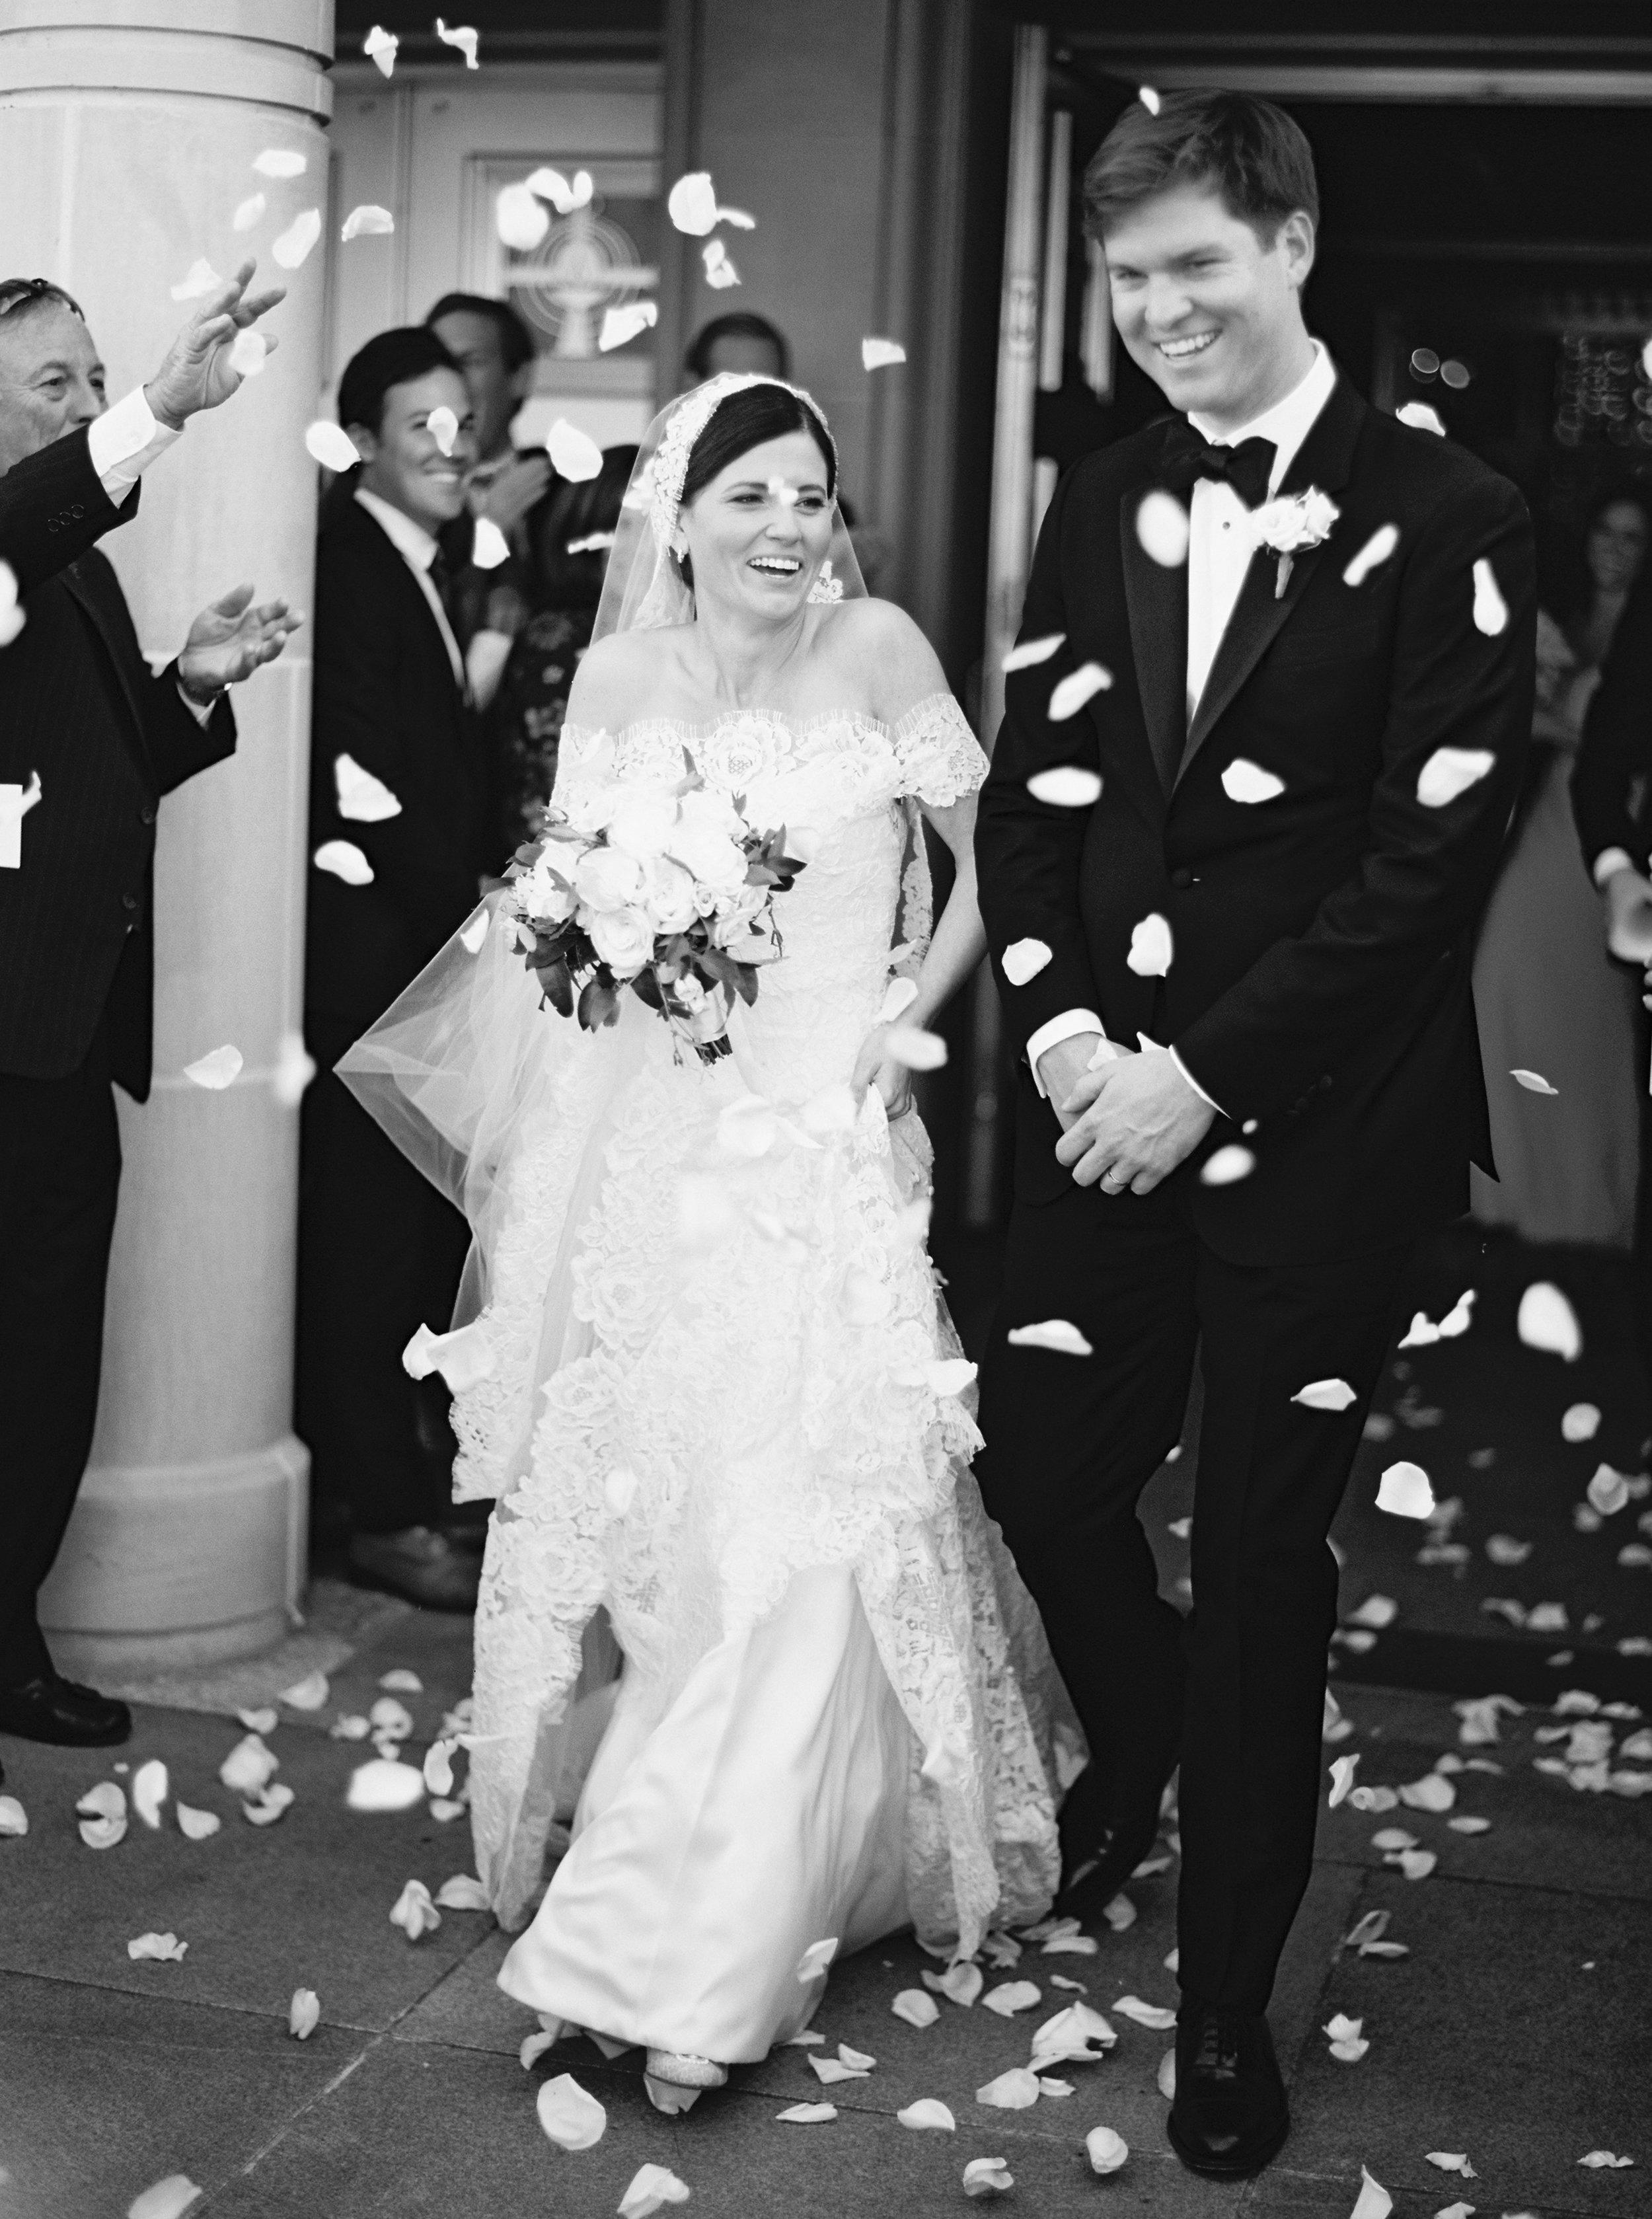 Kyle John l Fine Art Wedding Photography l Chicago, Copenhagen, California, New York, Destination l Blog l Connie & Connor_Winnetka_17